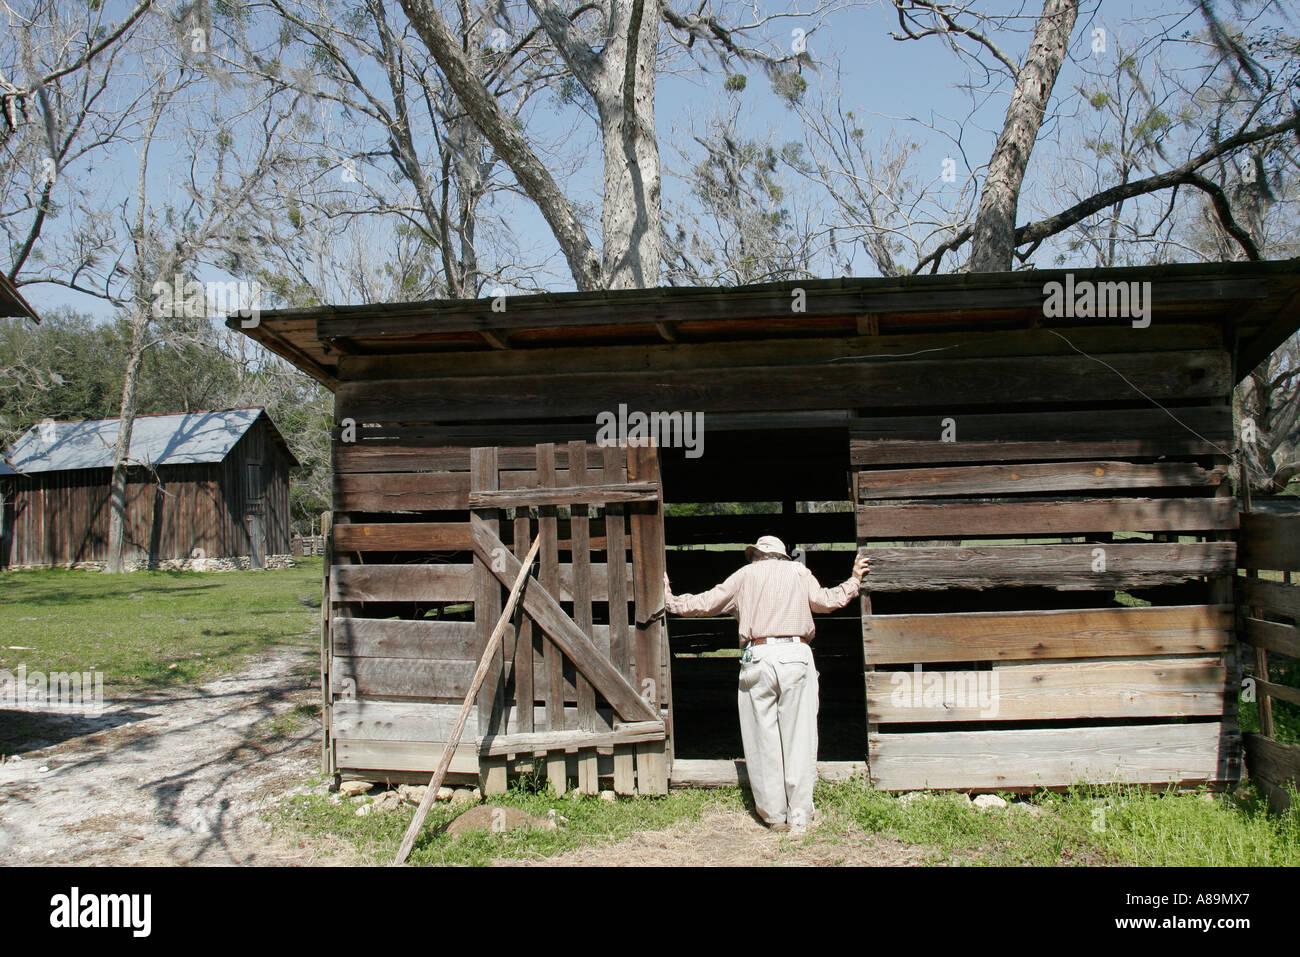 State Farm Jax Operation Center - Jacksonville, Florida ...